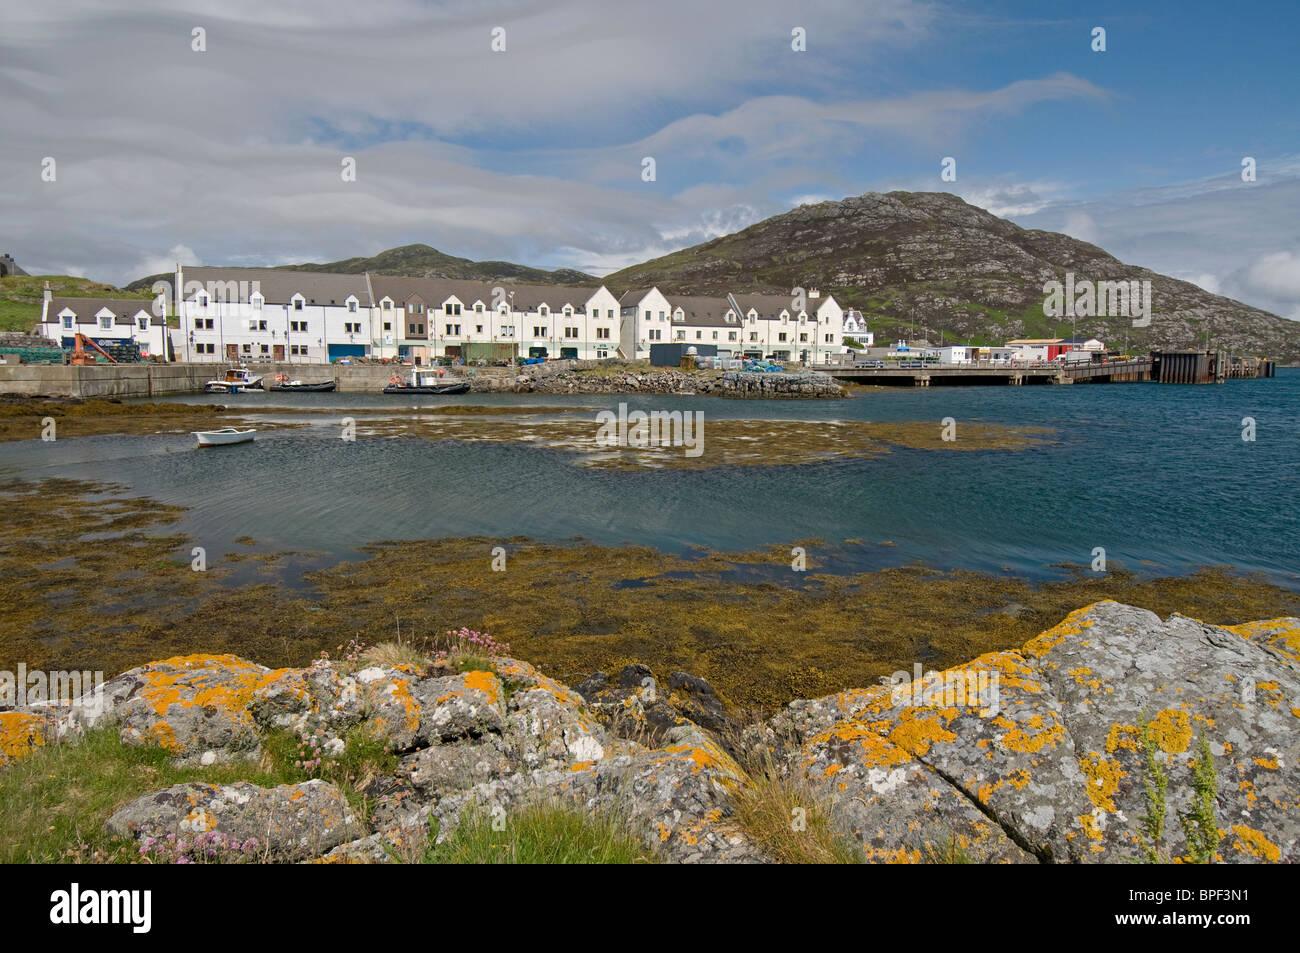 Lochboisdale ferry terminal Port, South Uist Outer Hebrides, Scotland.  SCO 6427 - Stock Image